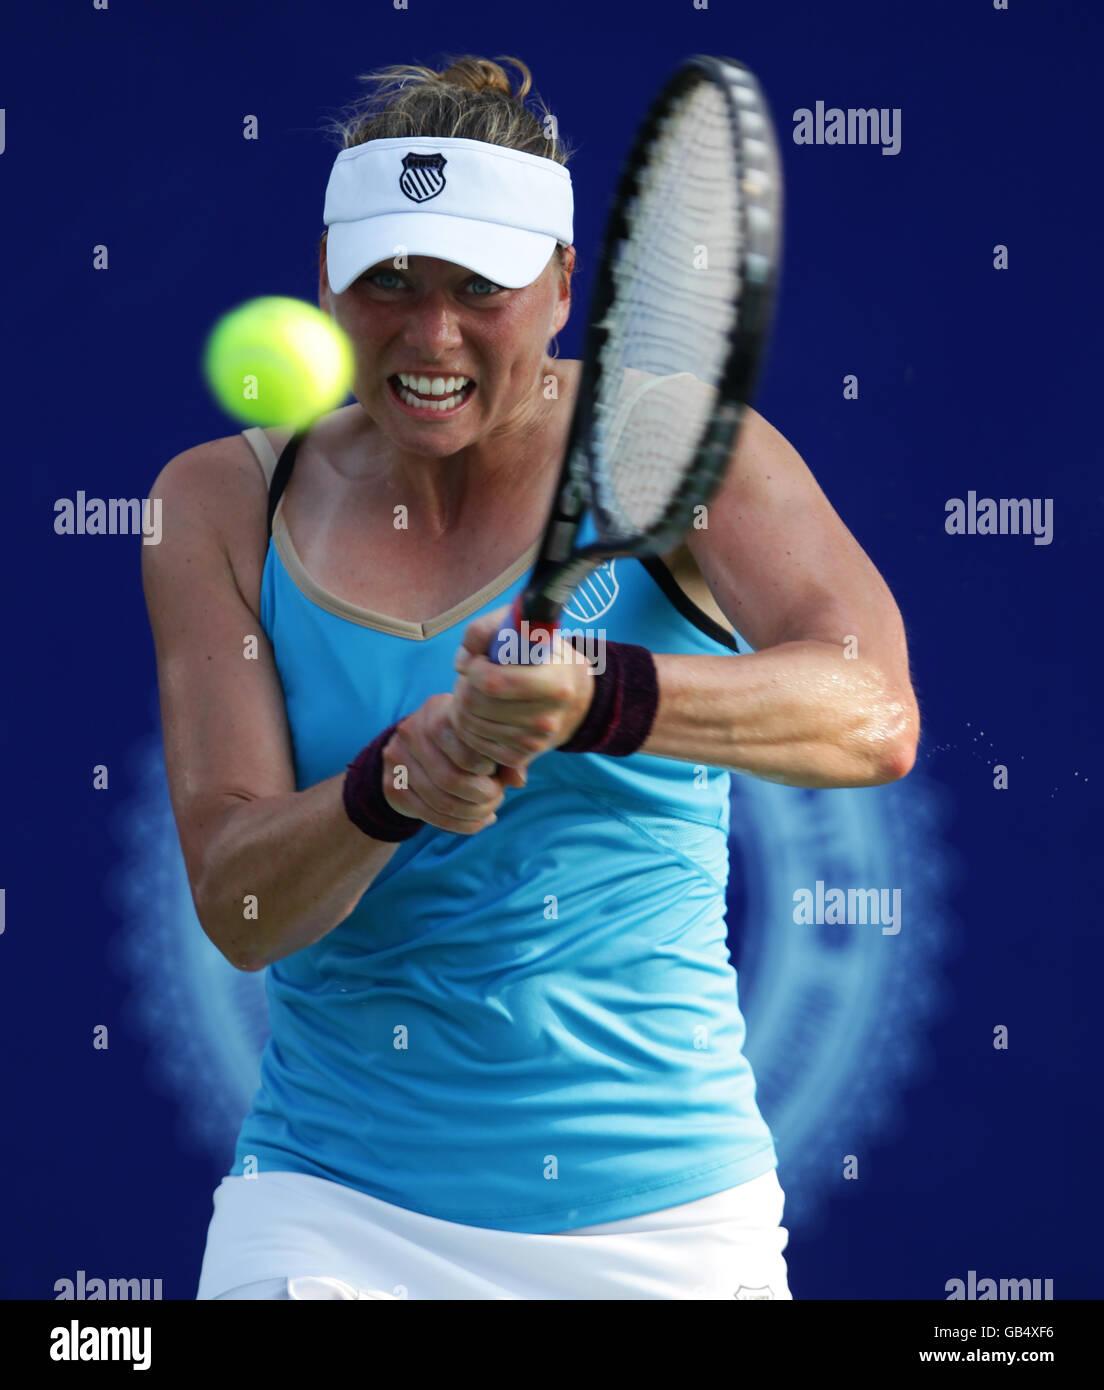 La tenista rusa Vera Zvonareva, PTT Pattaya Open 2011, Torneo de Tenis de la WTA, Series Internacionales, Dusit resort Pattaya. Foto de stock